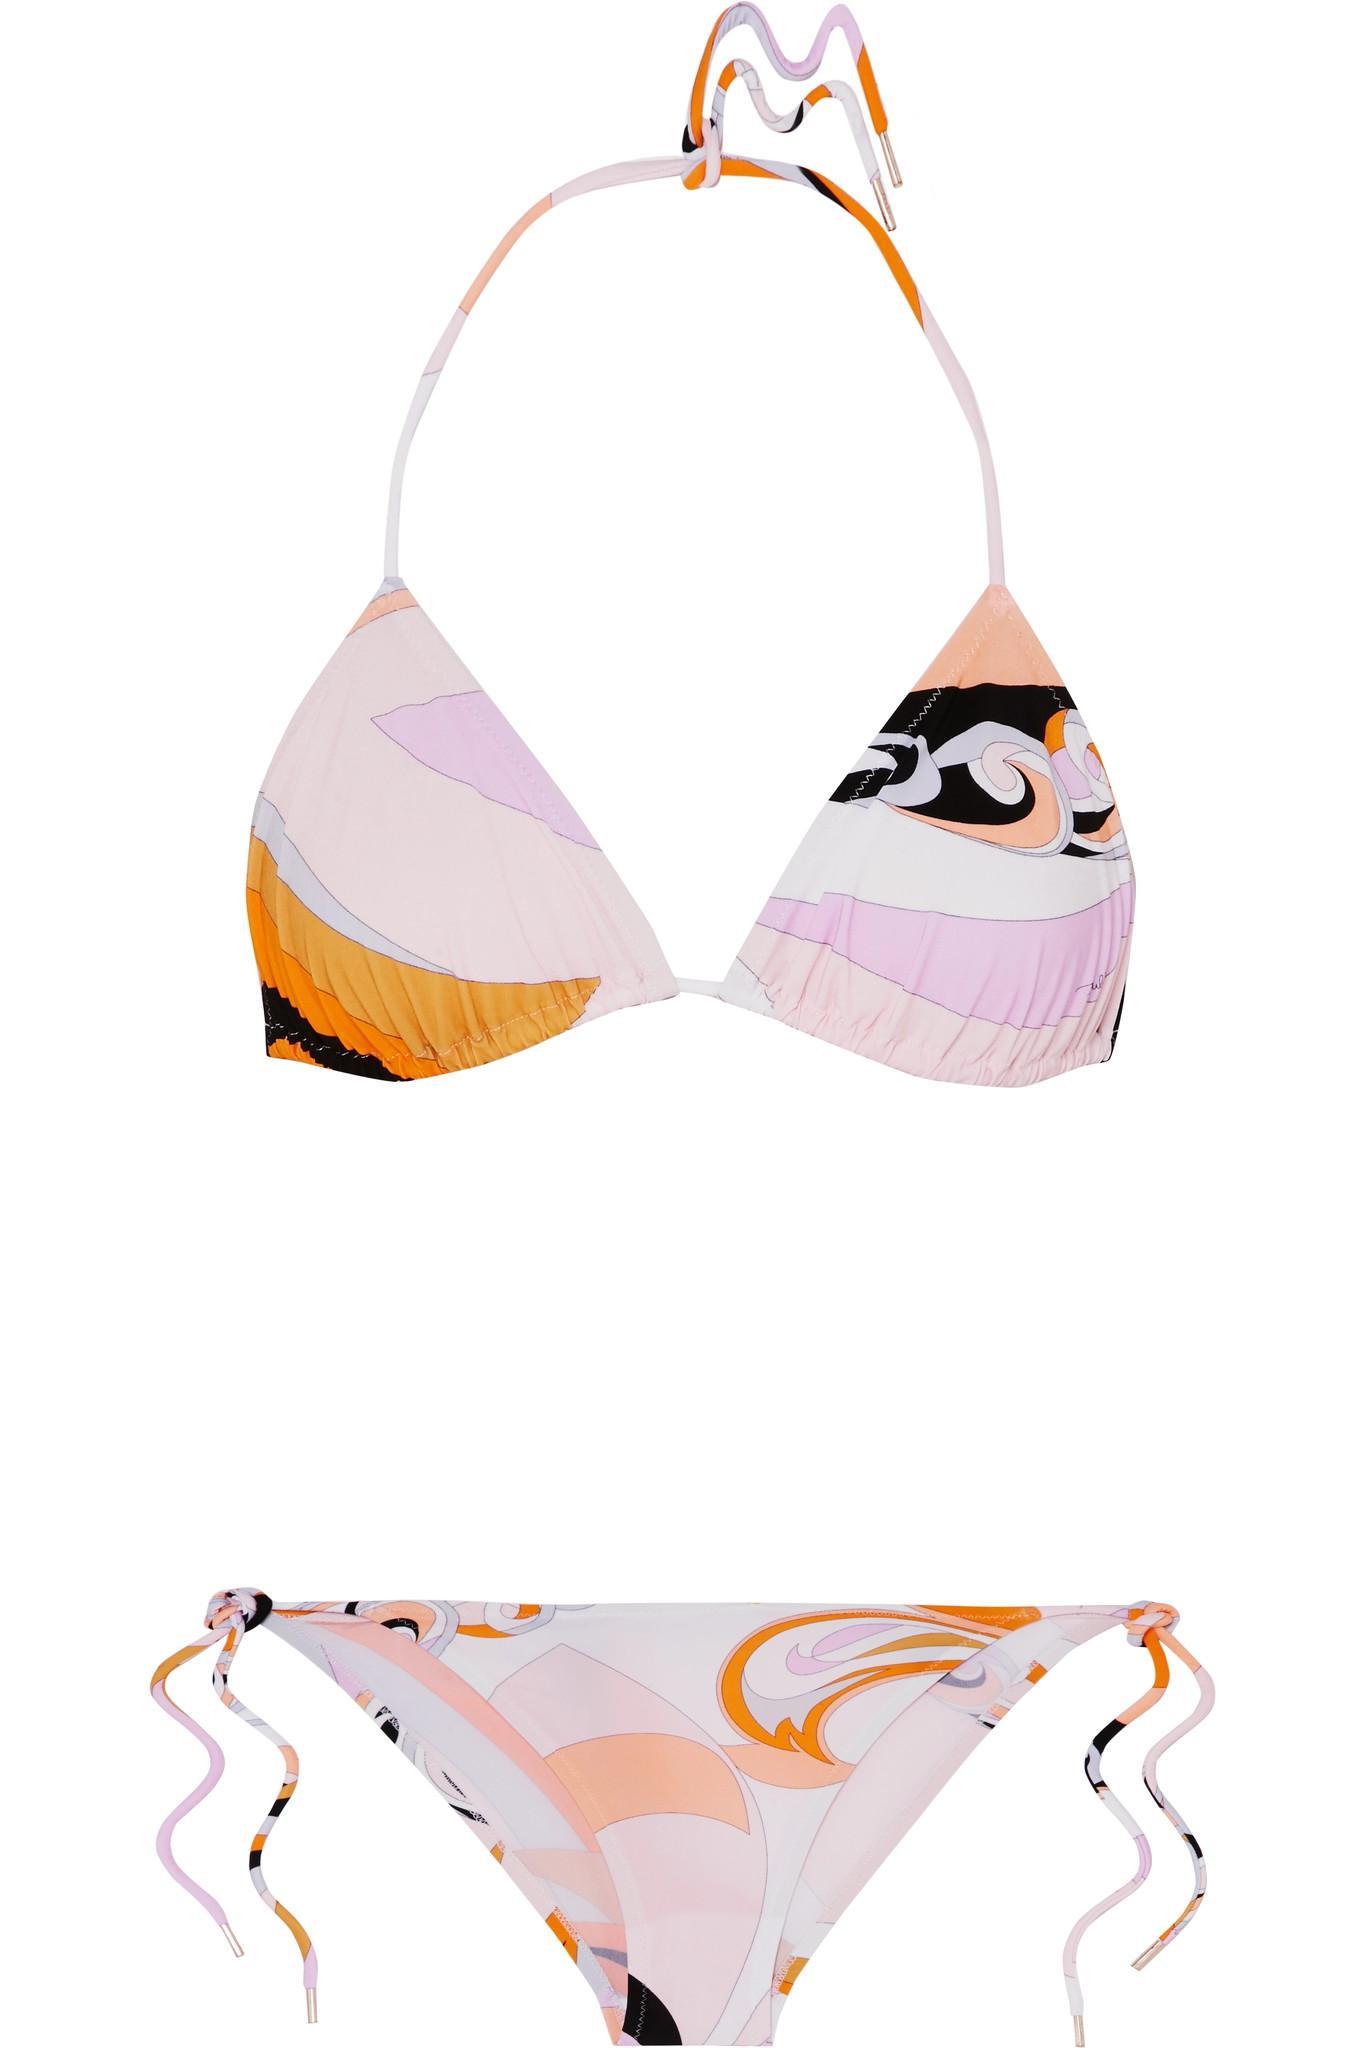 Cheap Sale Official Site printed triangle bikini set - Yellow & Orange Emilio Pucci Browse Cheap Price Buy Best Low Cost Cheap Price Buy Cheap 2018 Unisex 9fW3AlDV